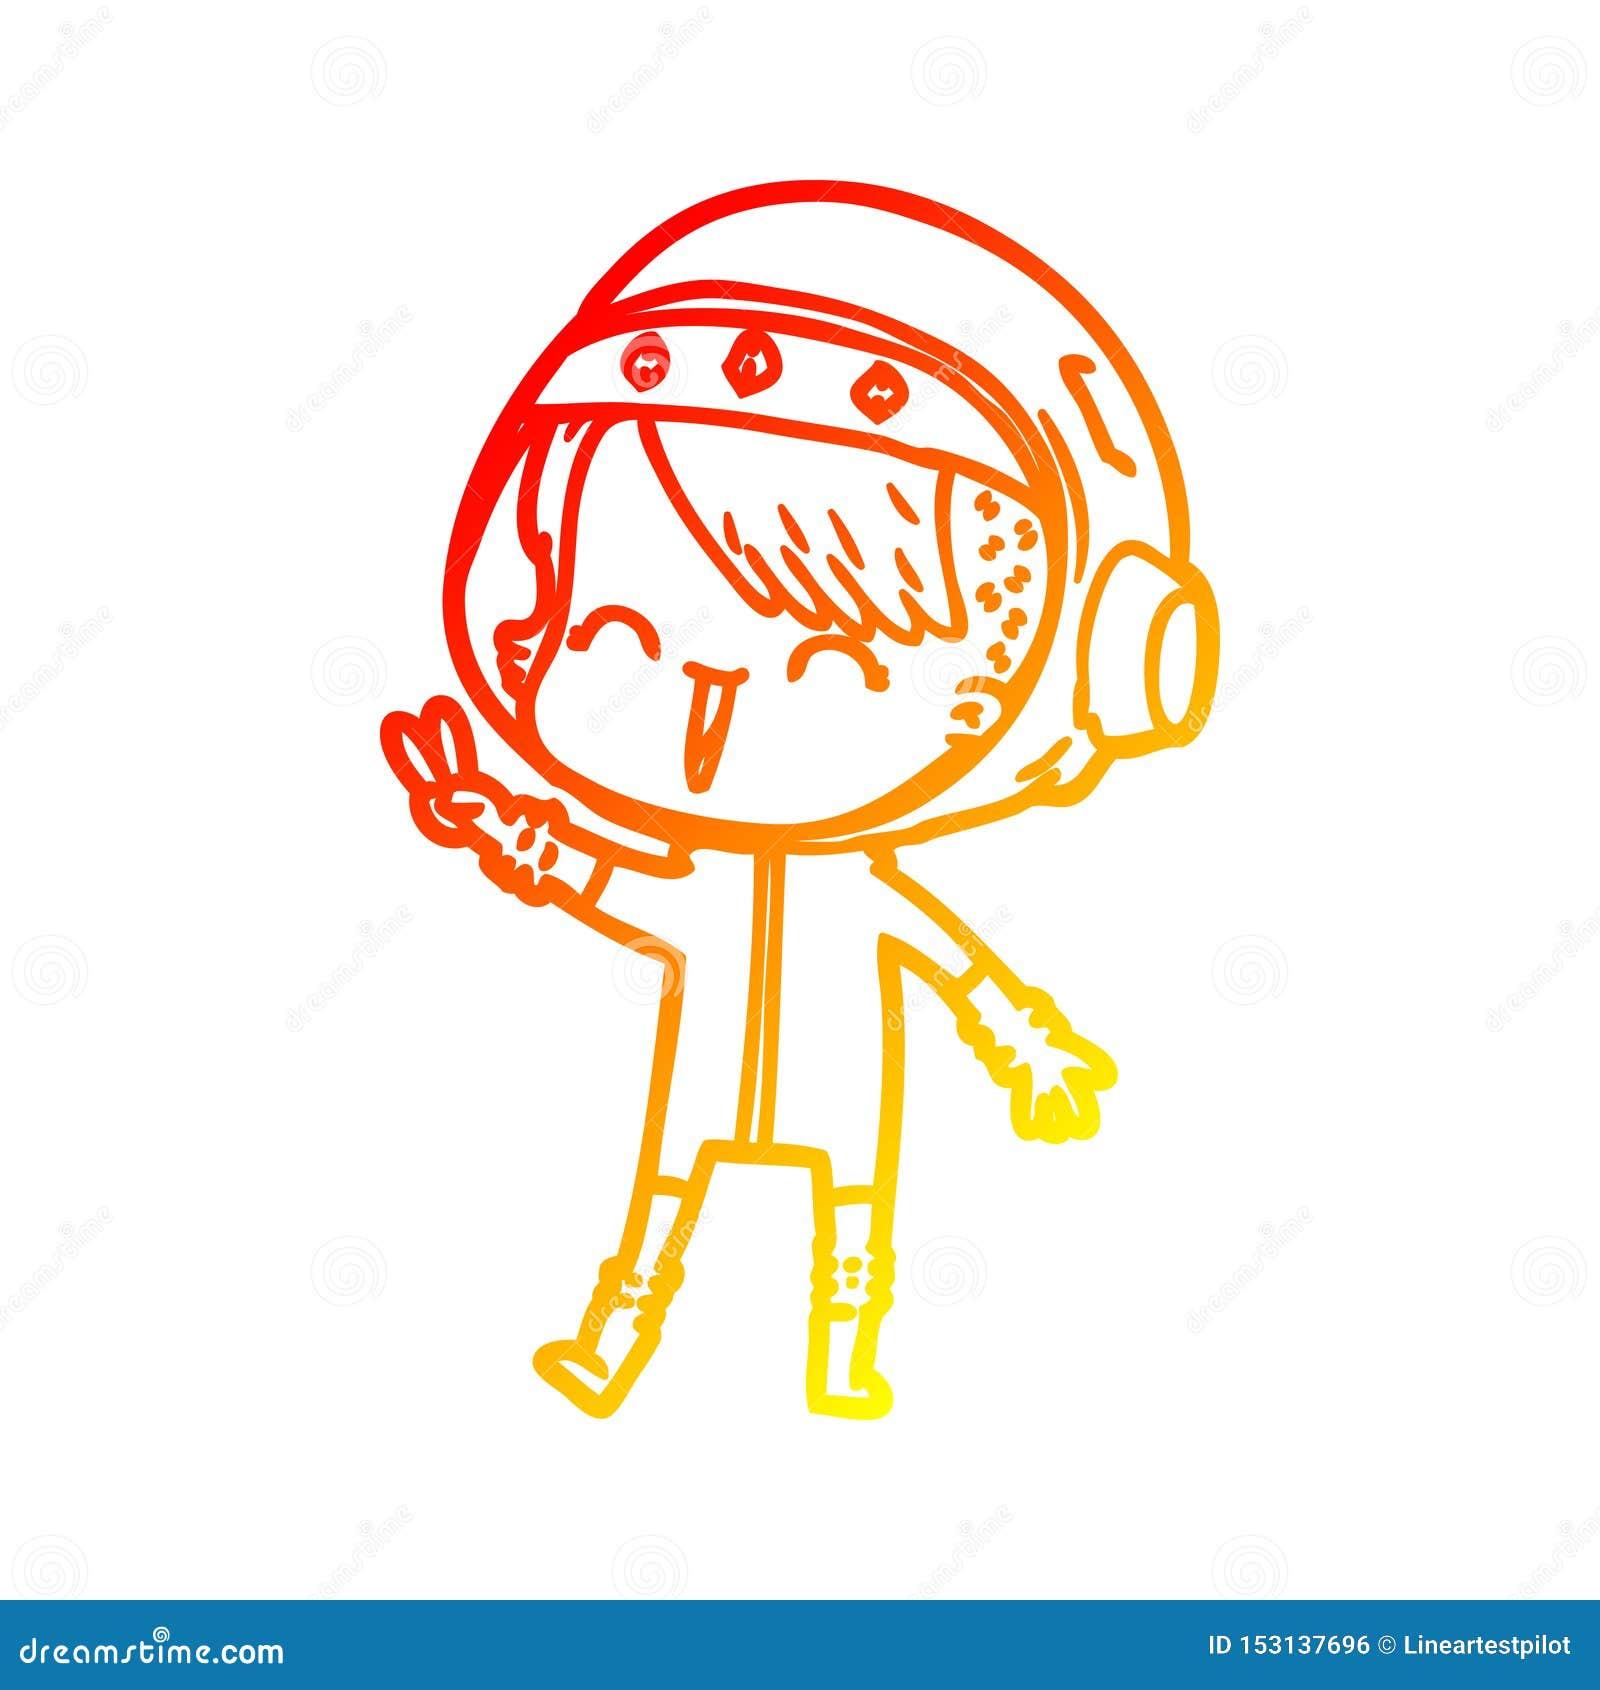 A Creative Warm Gradient Line Drawing Happy Cartoon Space Girl